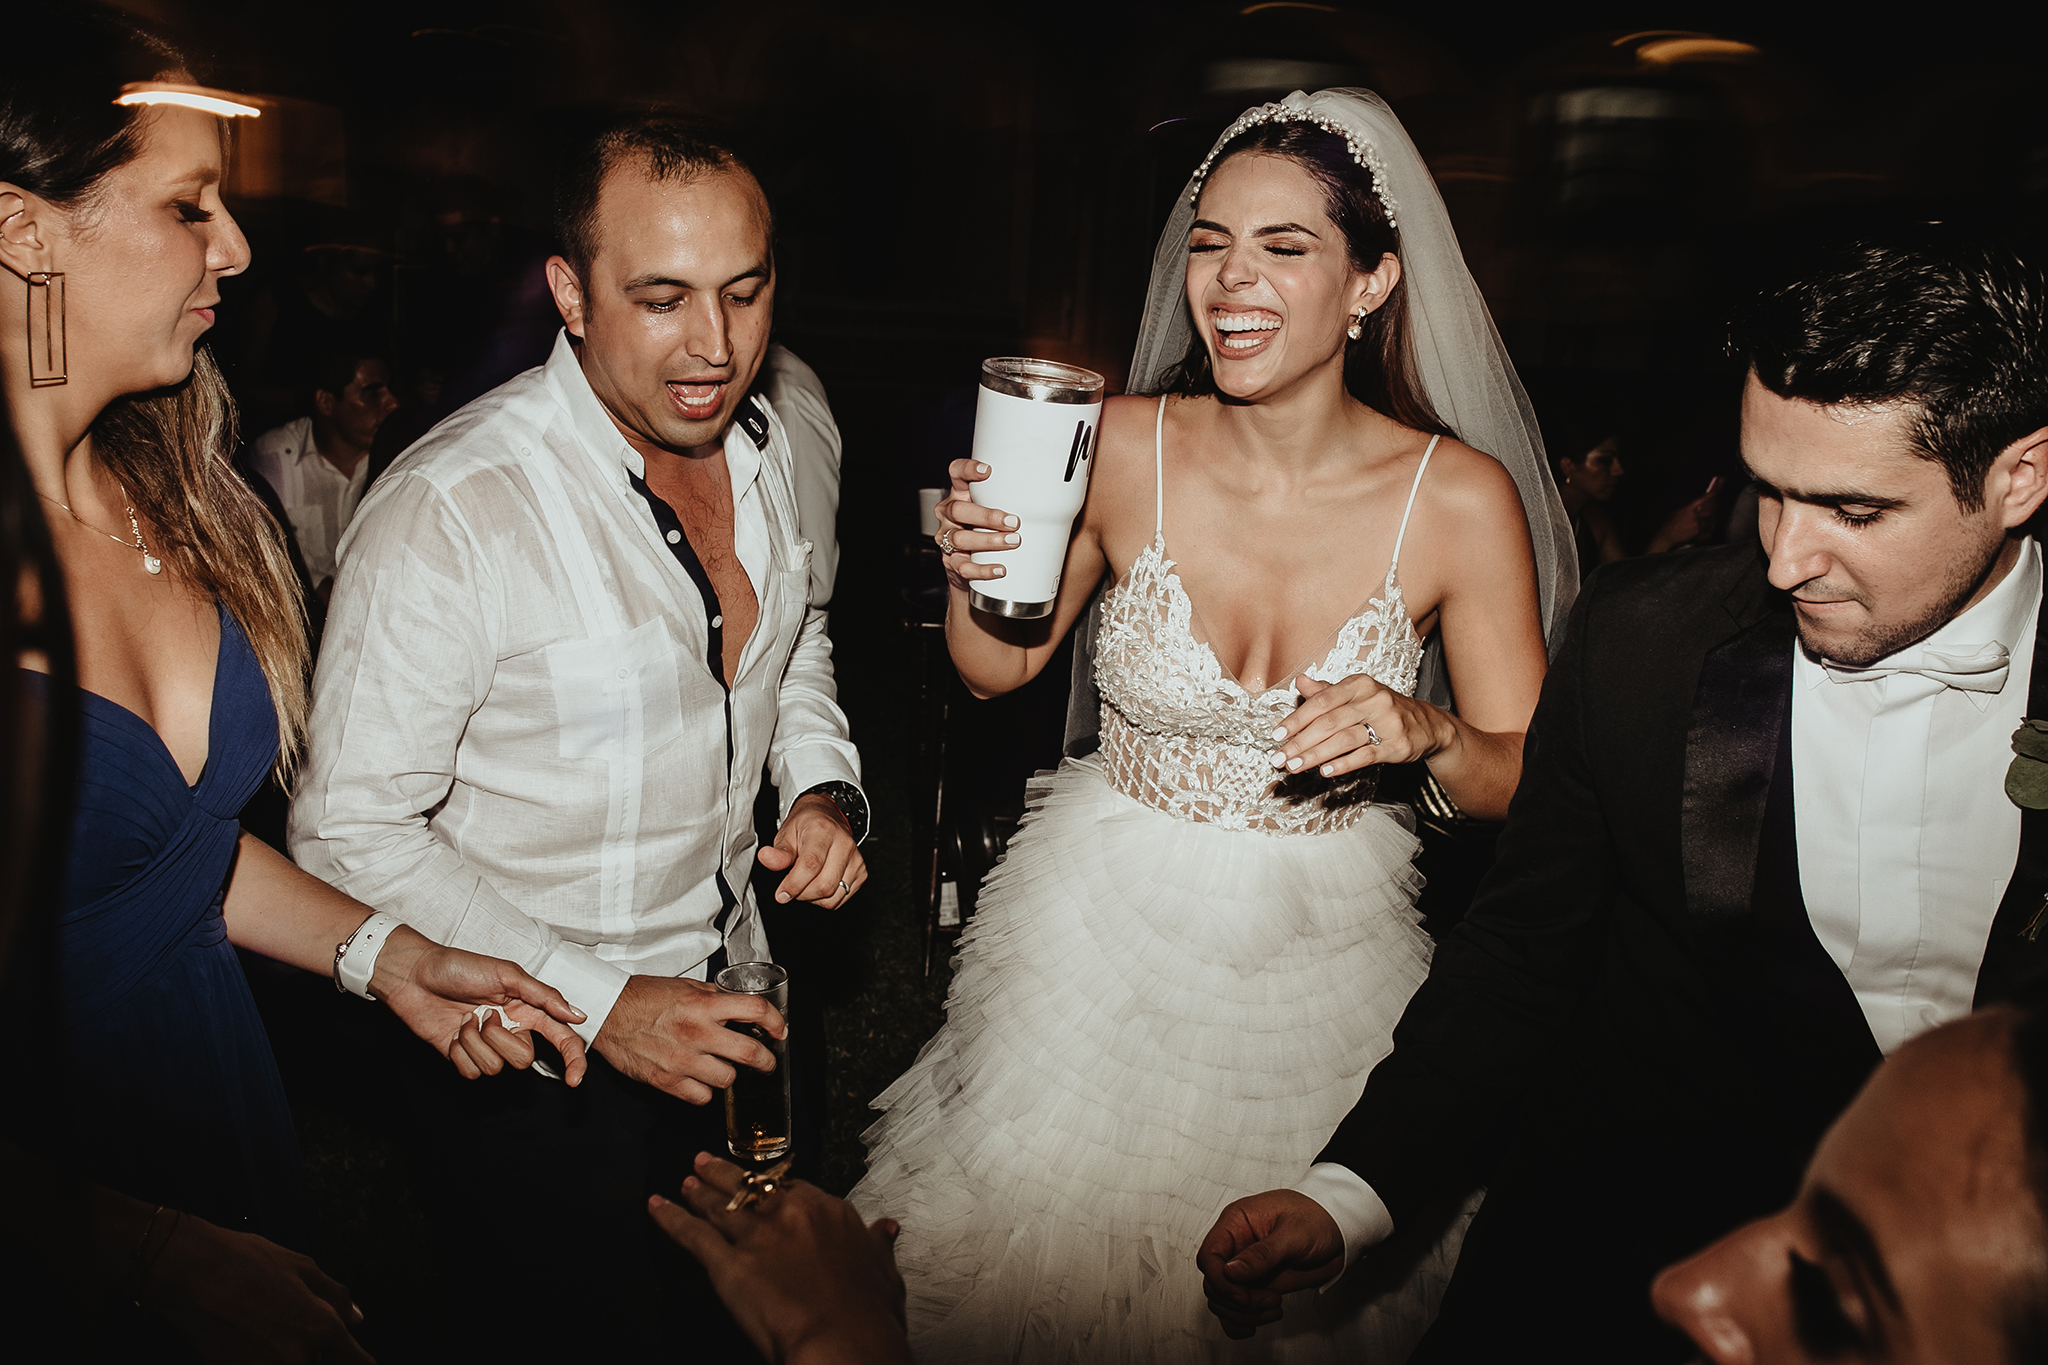 1202R&F__WeddingDestination_Weddingmerida_BodaMexico_FotografoDeBodas_FabrizioSimoneenFotografo.jpg